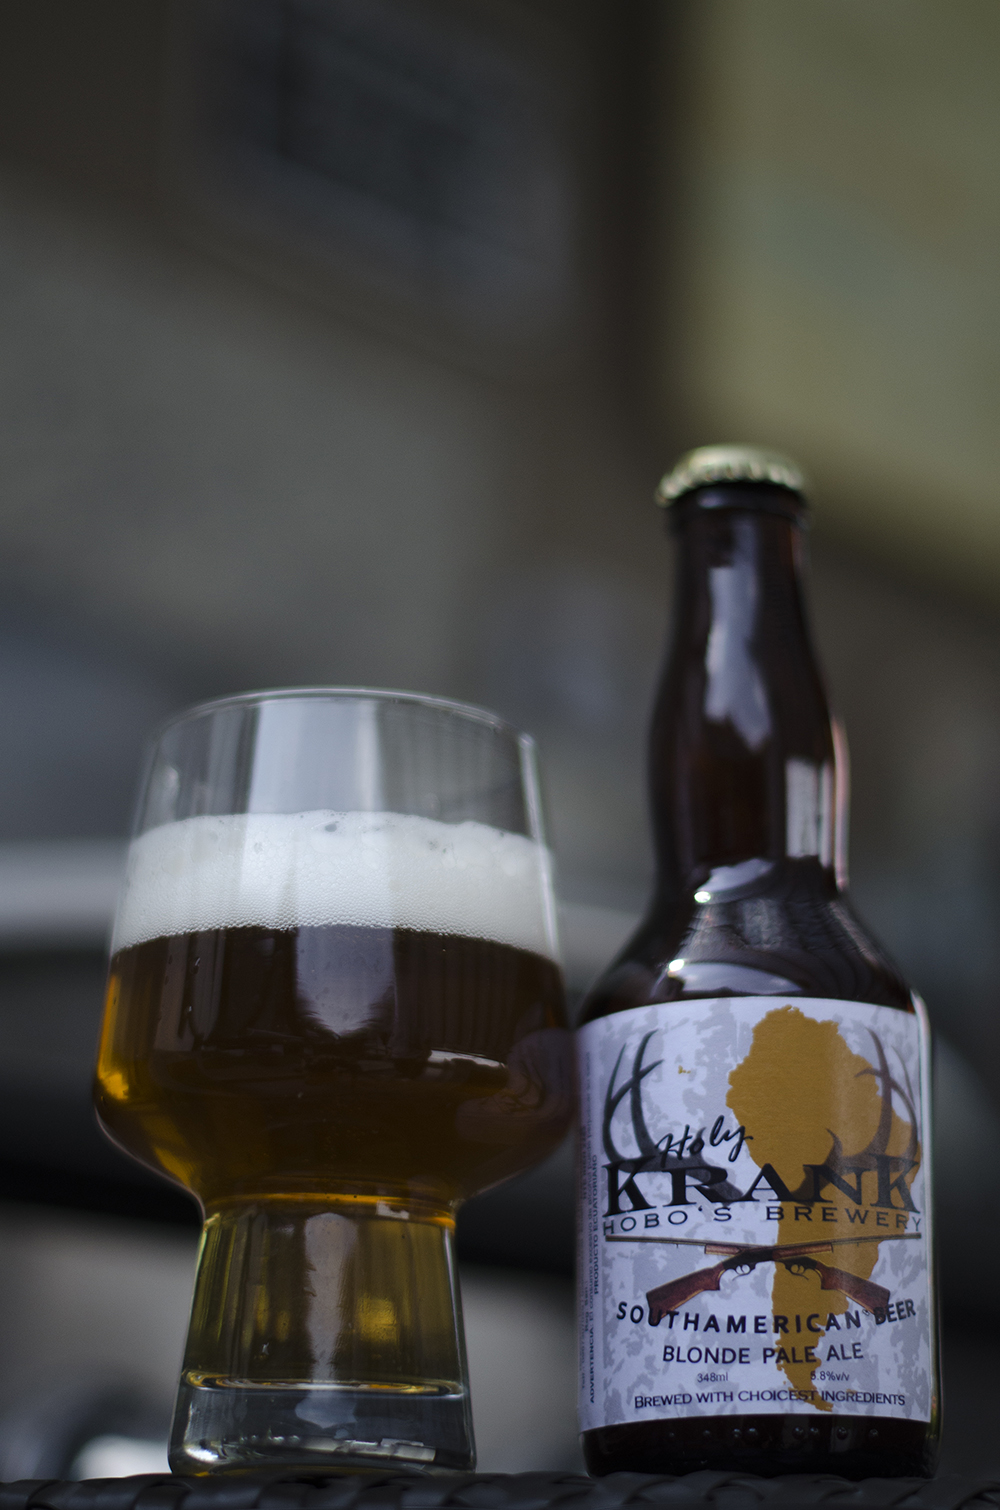 Krank Hobo's Brewery   Blonde Pale Ale  5,8%